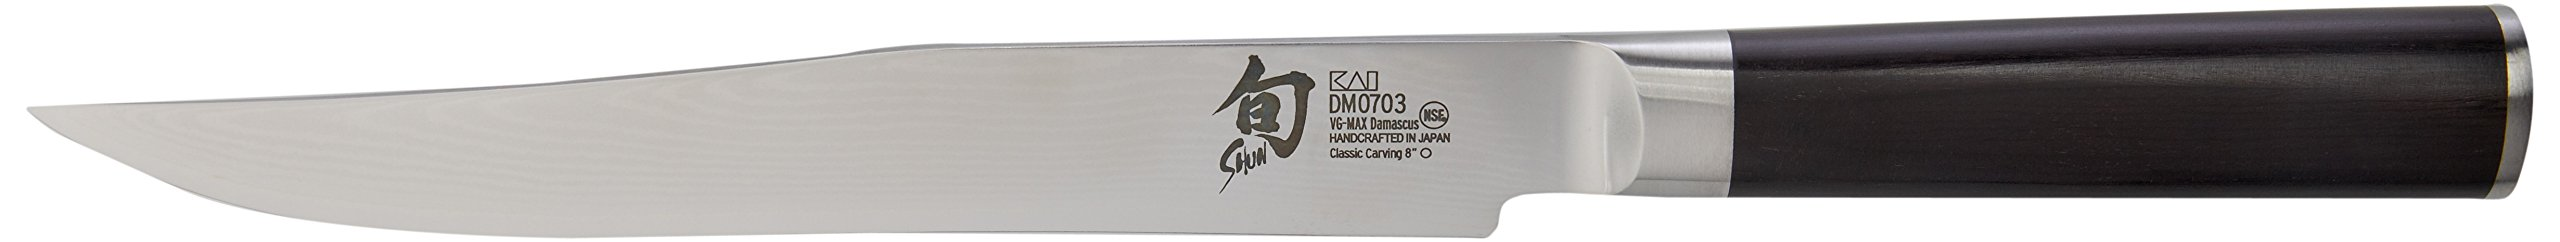 KAI Shun Classic Tranchiermesser Klinge 20,0 cm